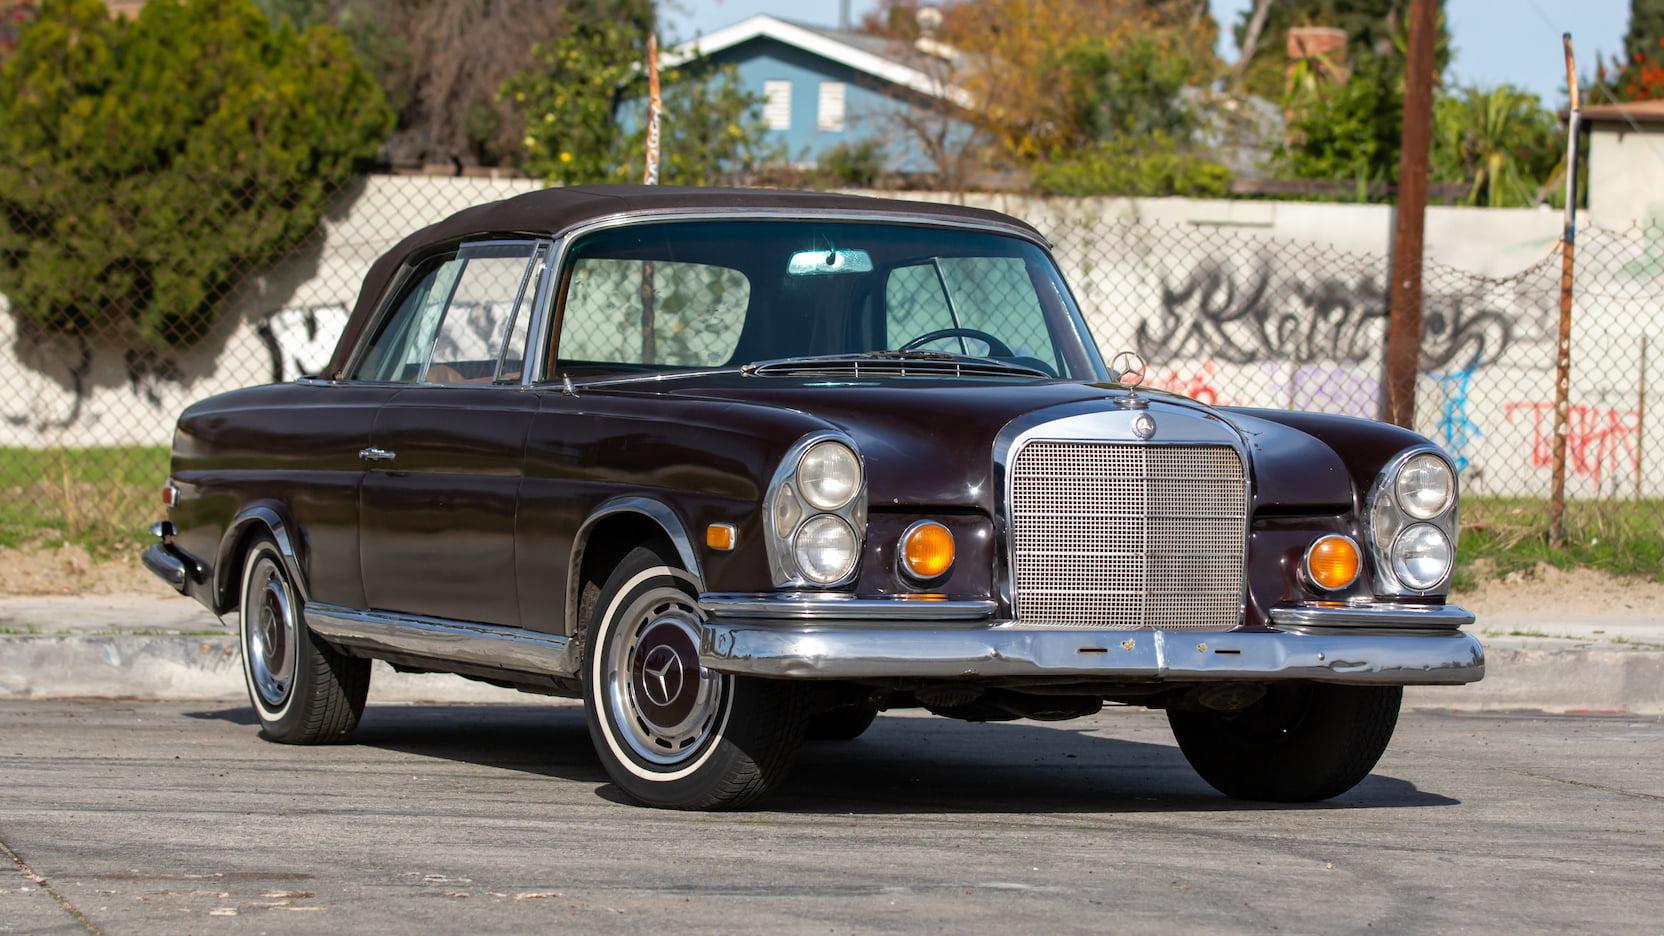 1969 Mercedes-Benz 280SE convertible